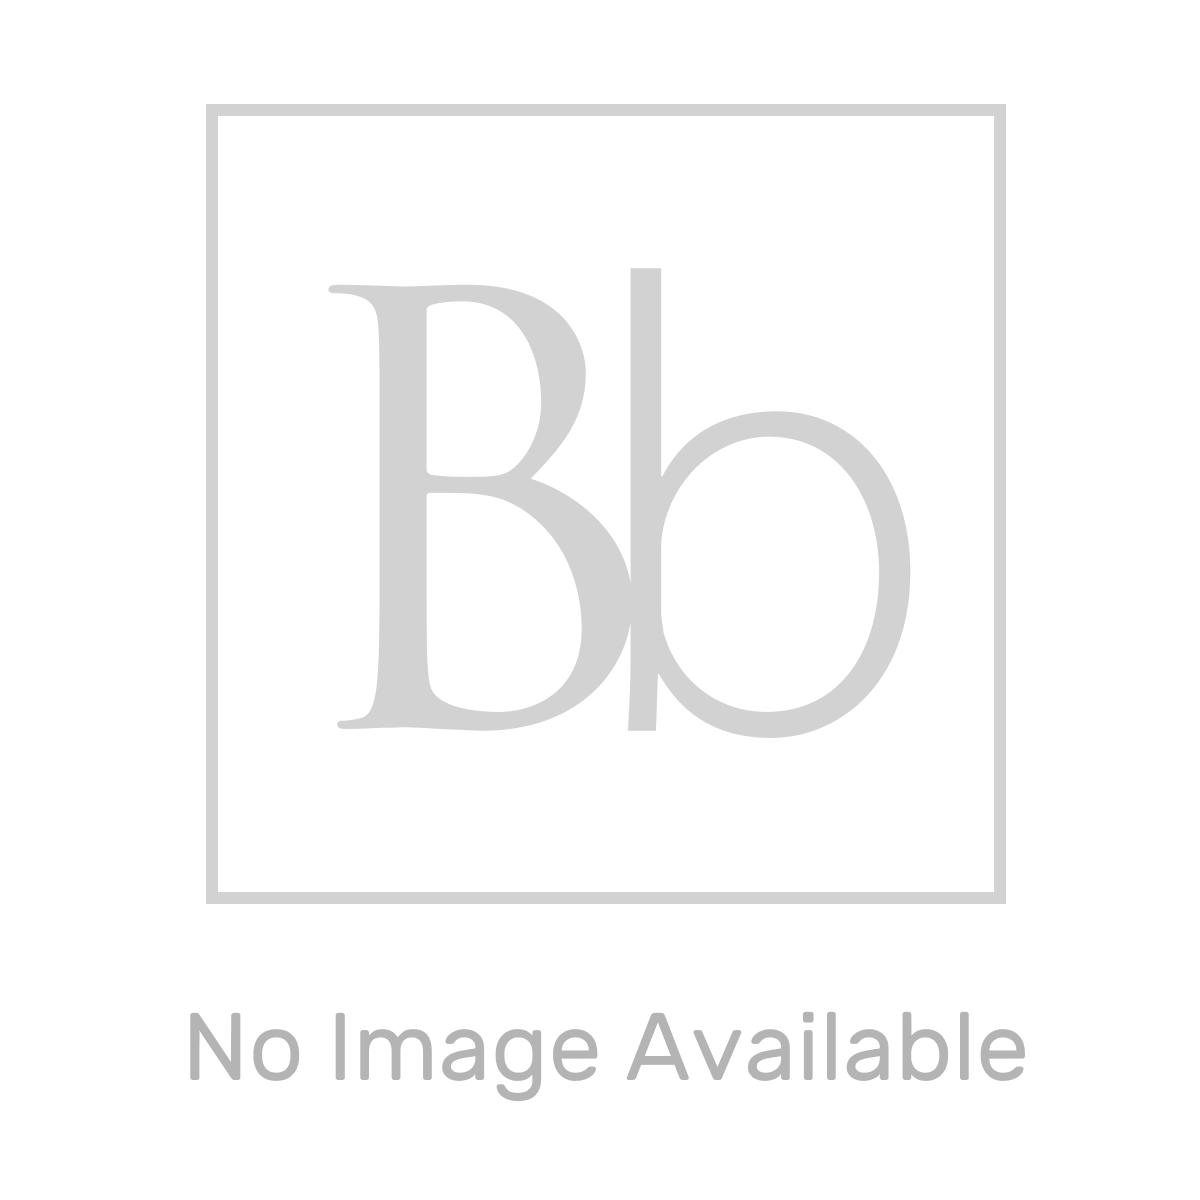 Kartell K-vit Low Profile Shower Quadrant Trays 1000mm x 1000mm